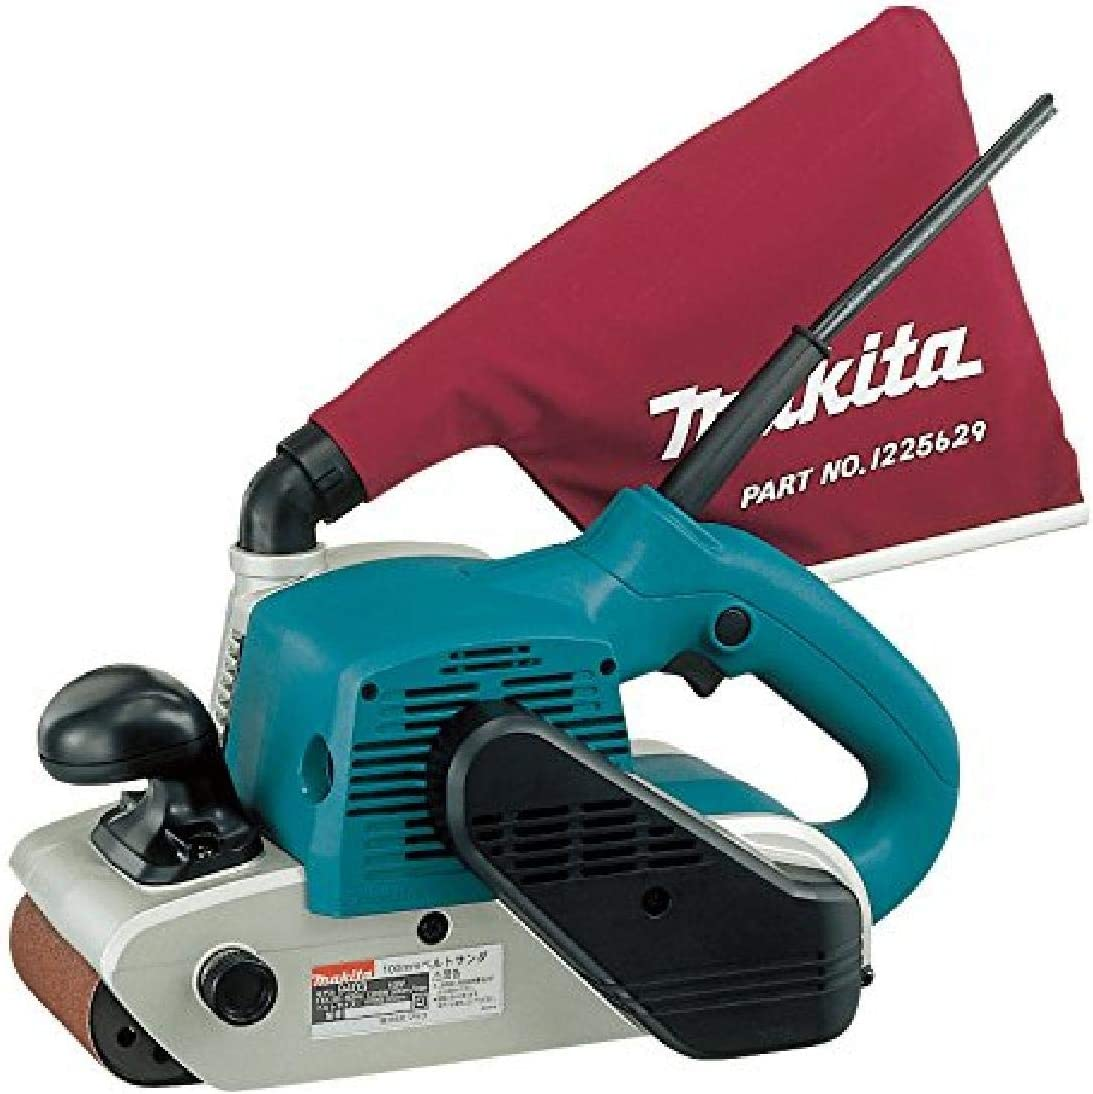 Makita 9403 Belt Sander with Cloth Dust Bag